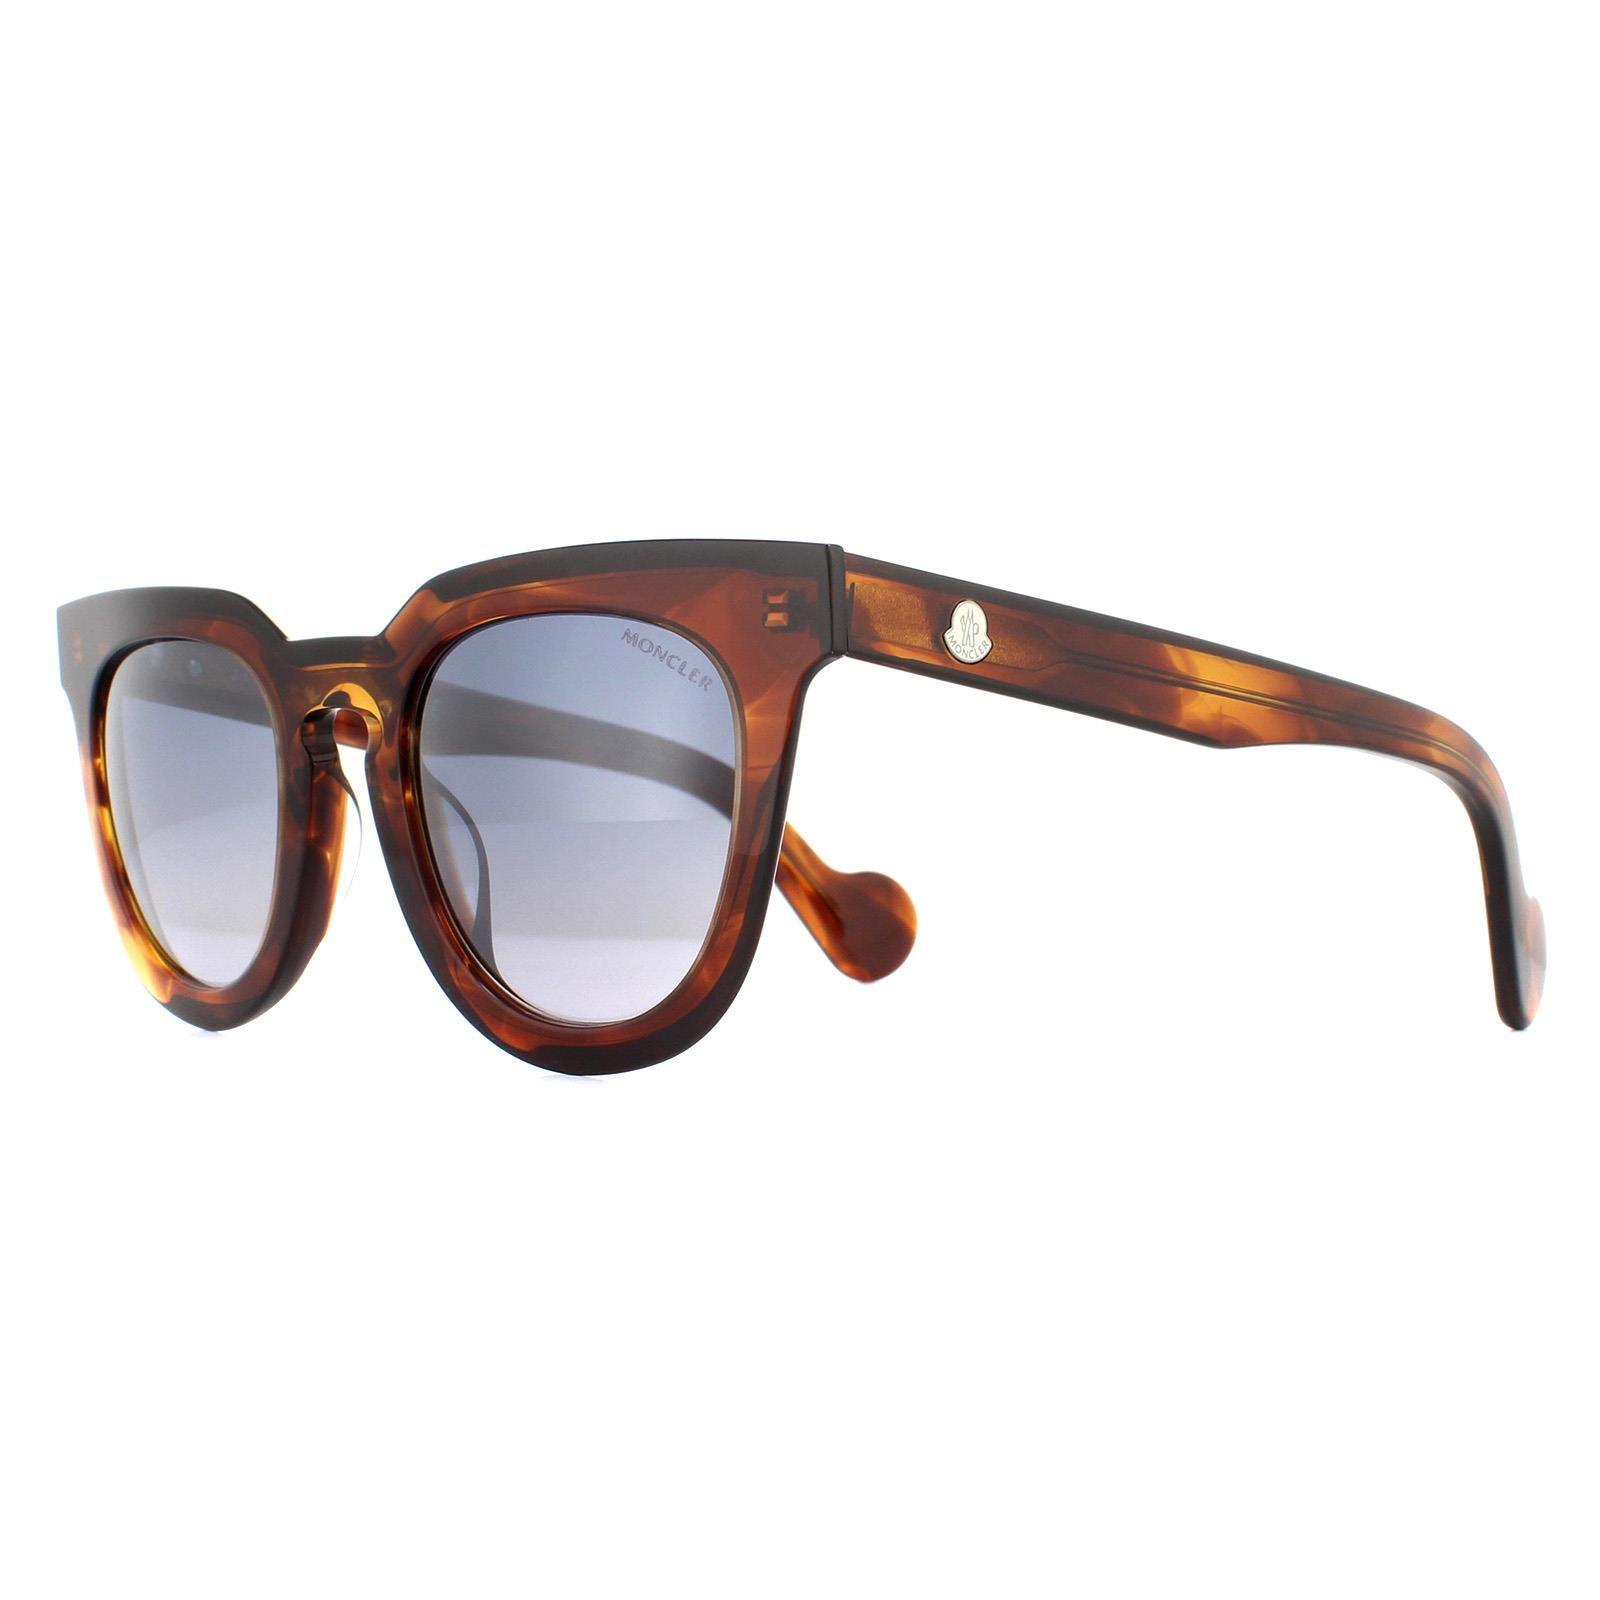 Moncler Sunglasses ML0008 45C Light Brown Smoke Mirror